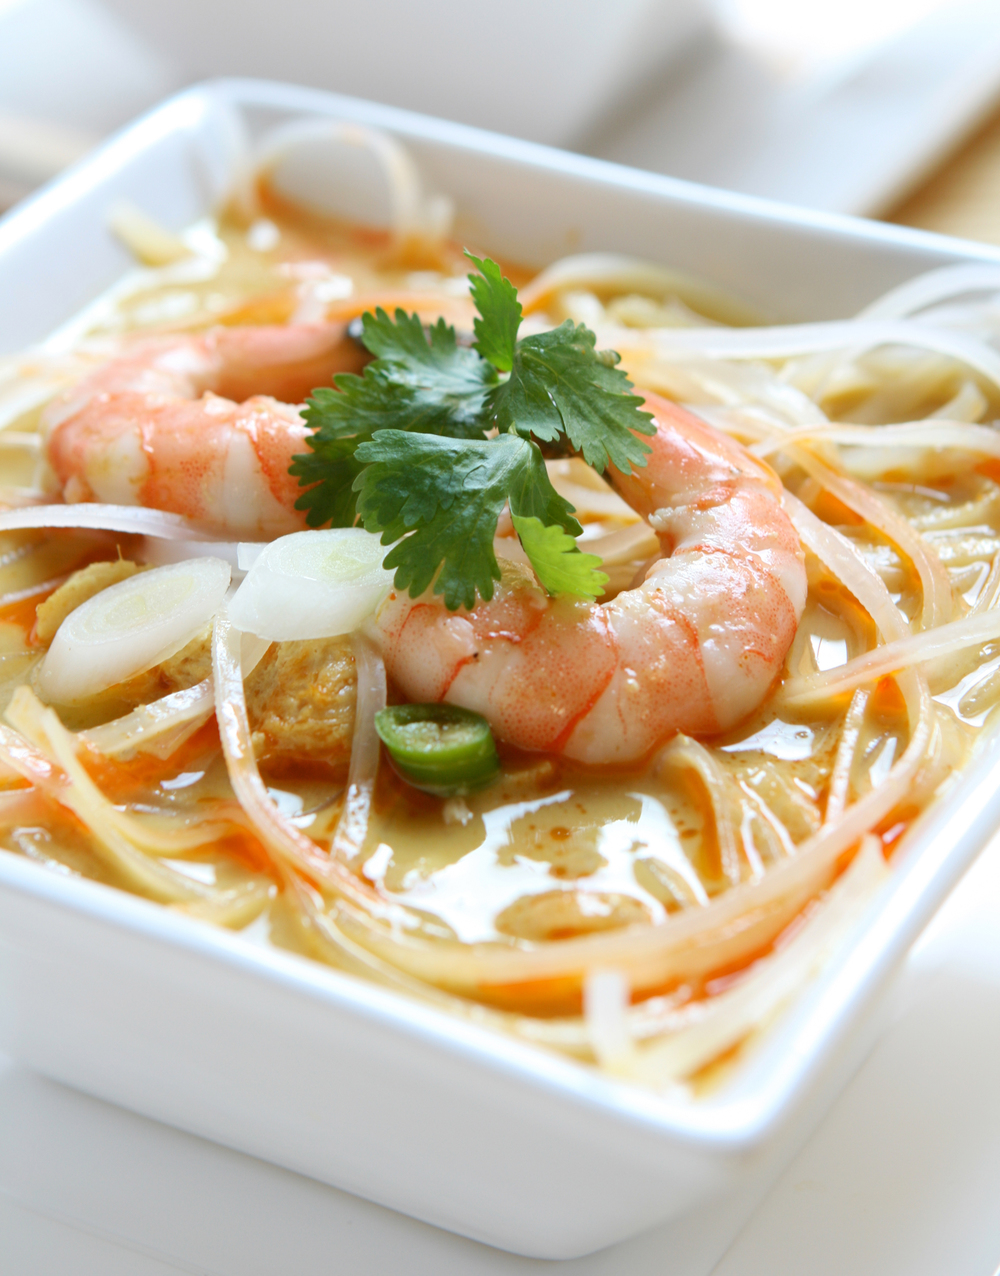 Vive-Cooking-School-Seafood-Laksa.jpeg